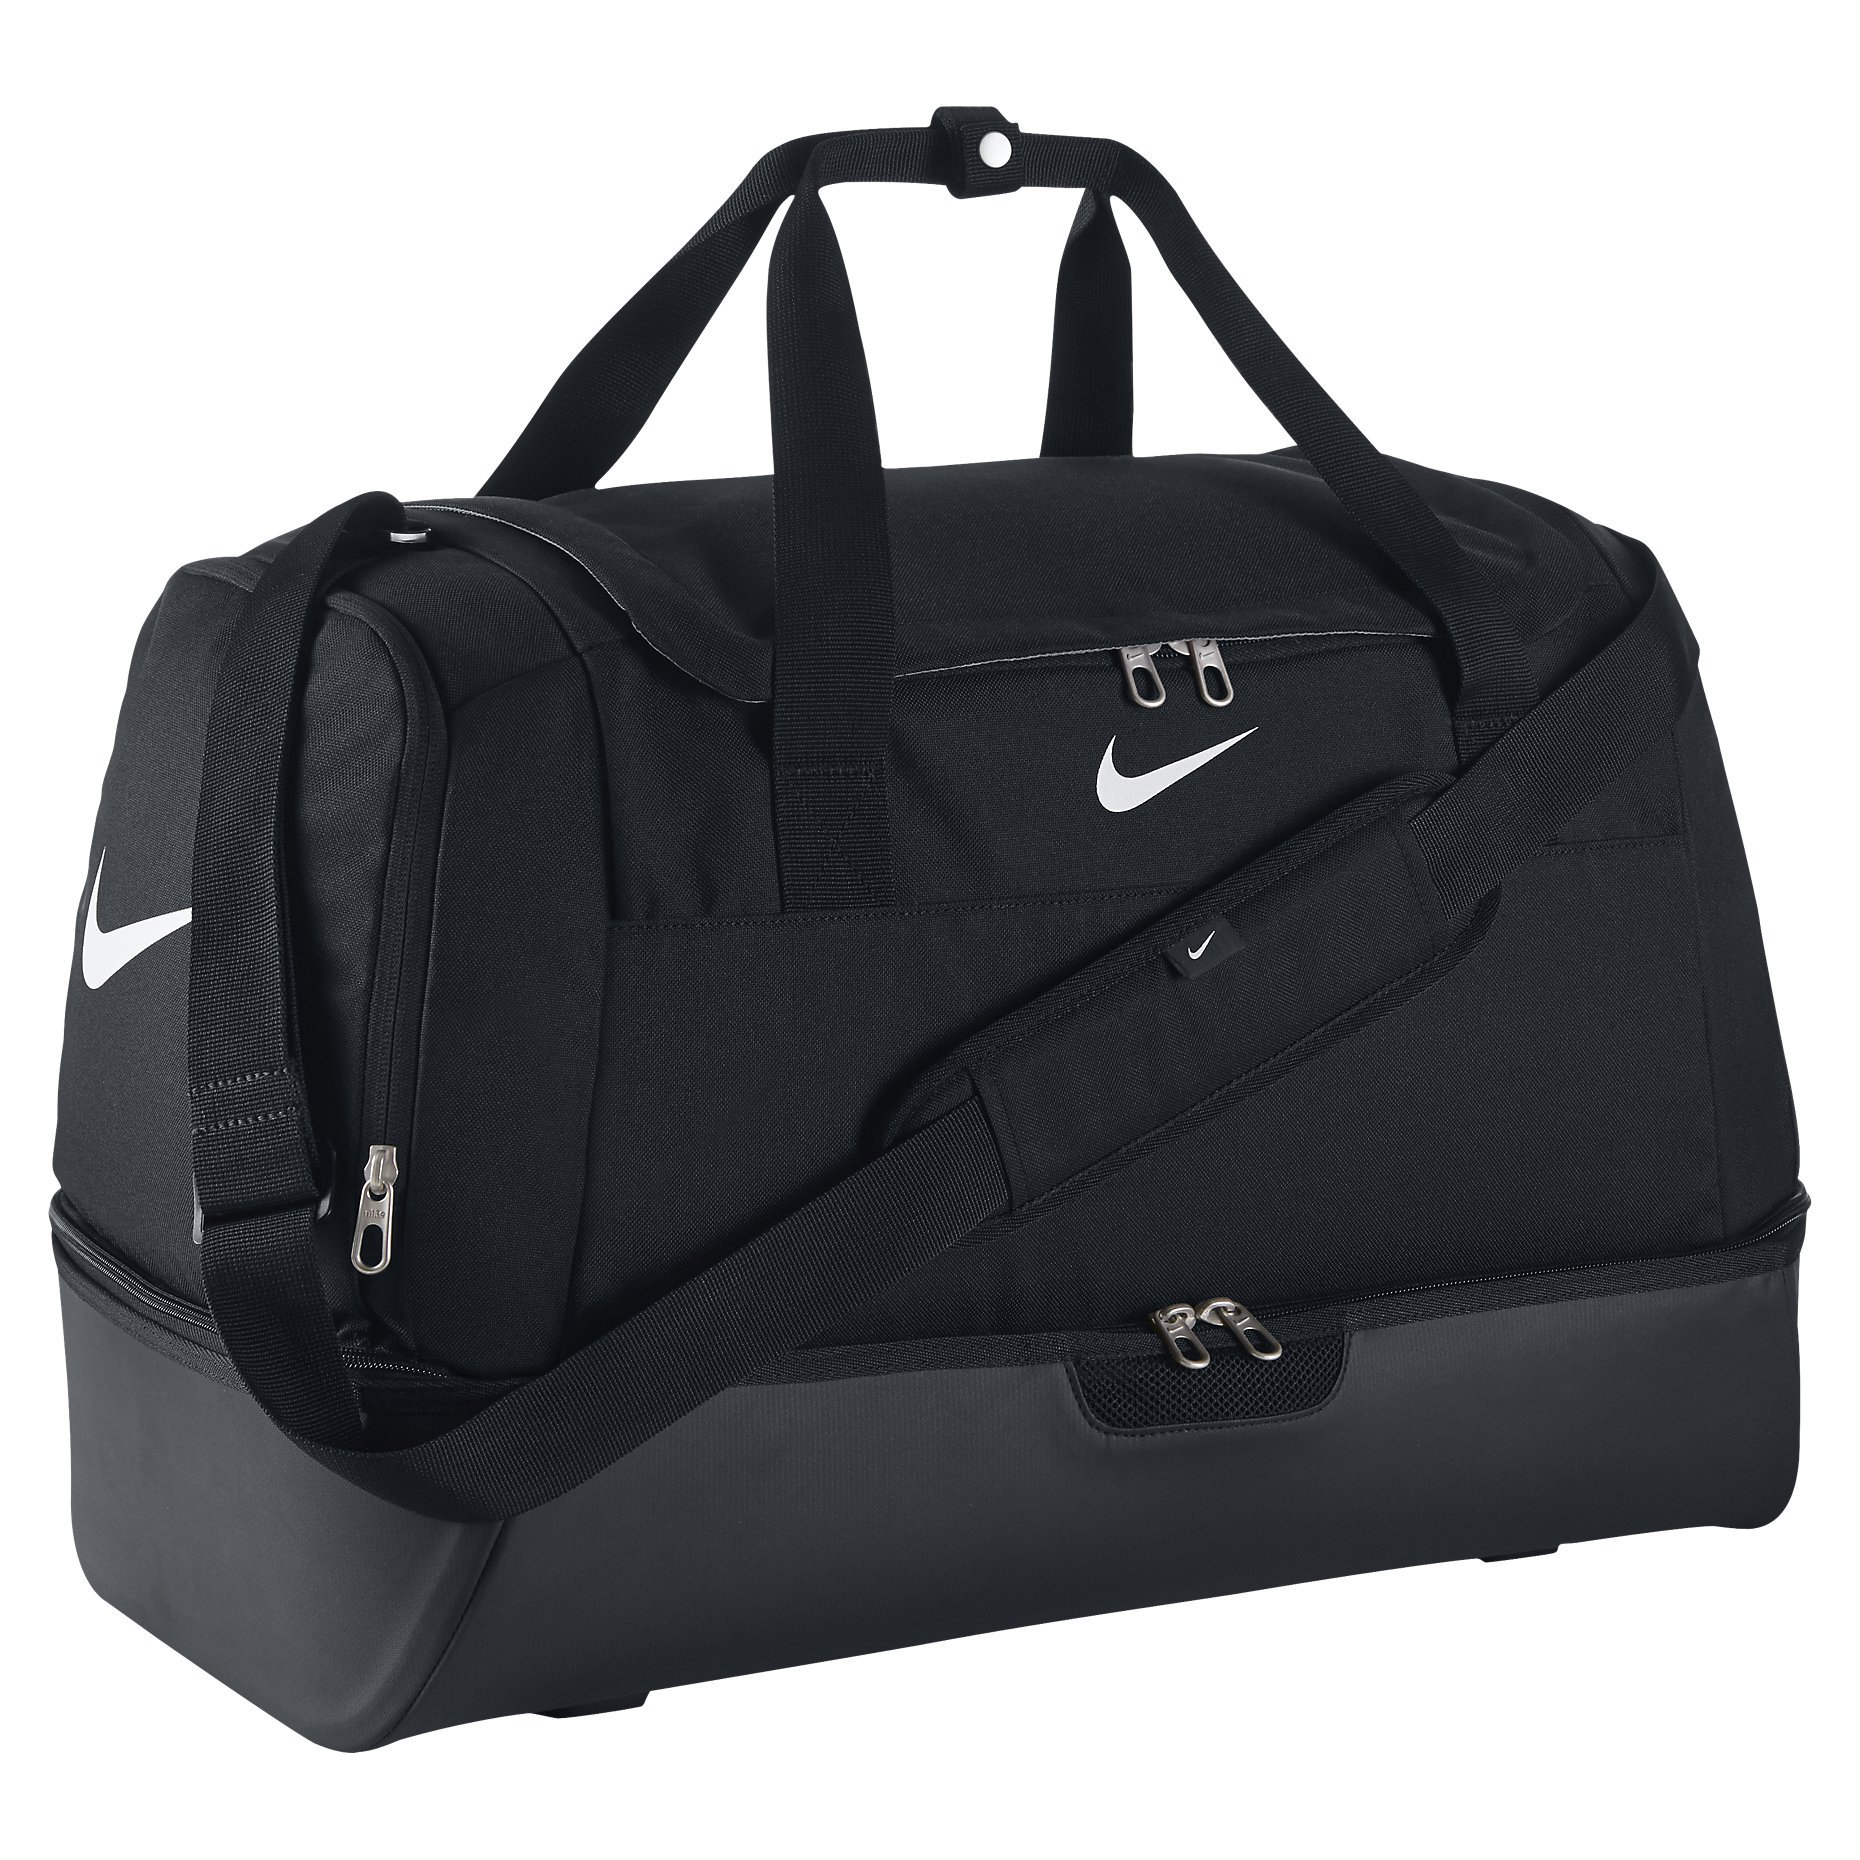 Taška Nike Club Team Swoosh Hardcase XL